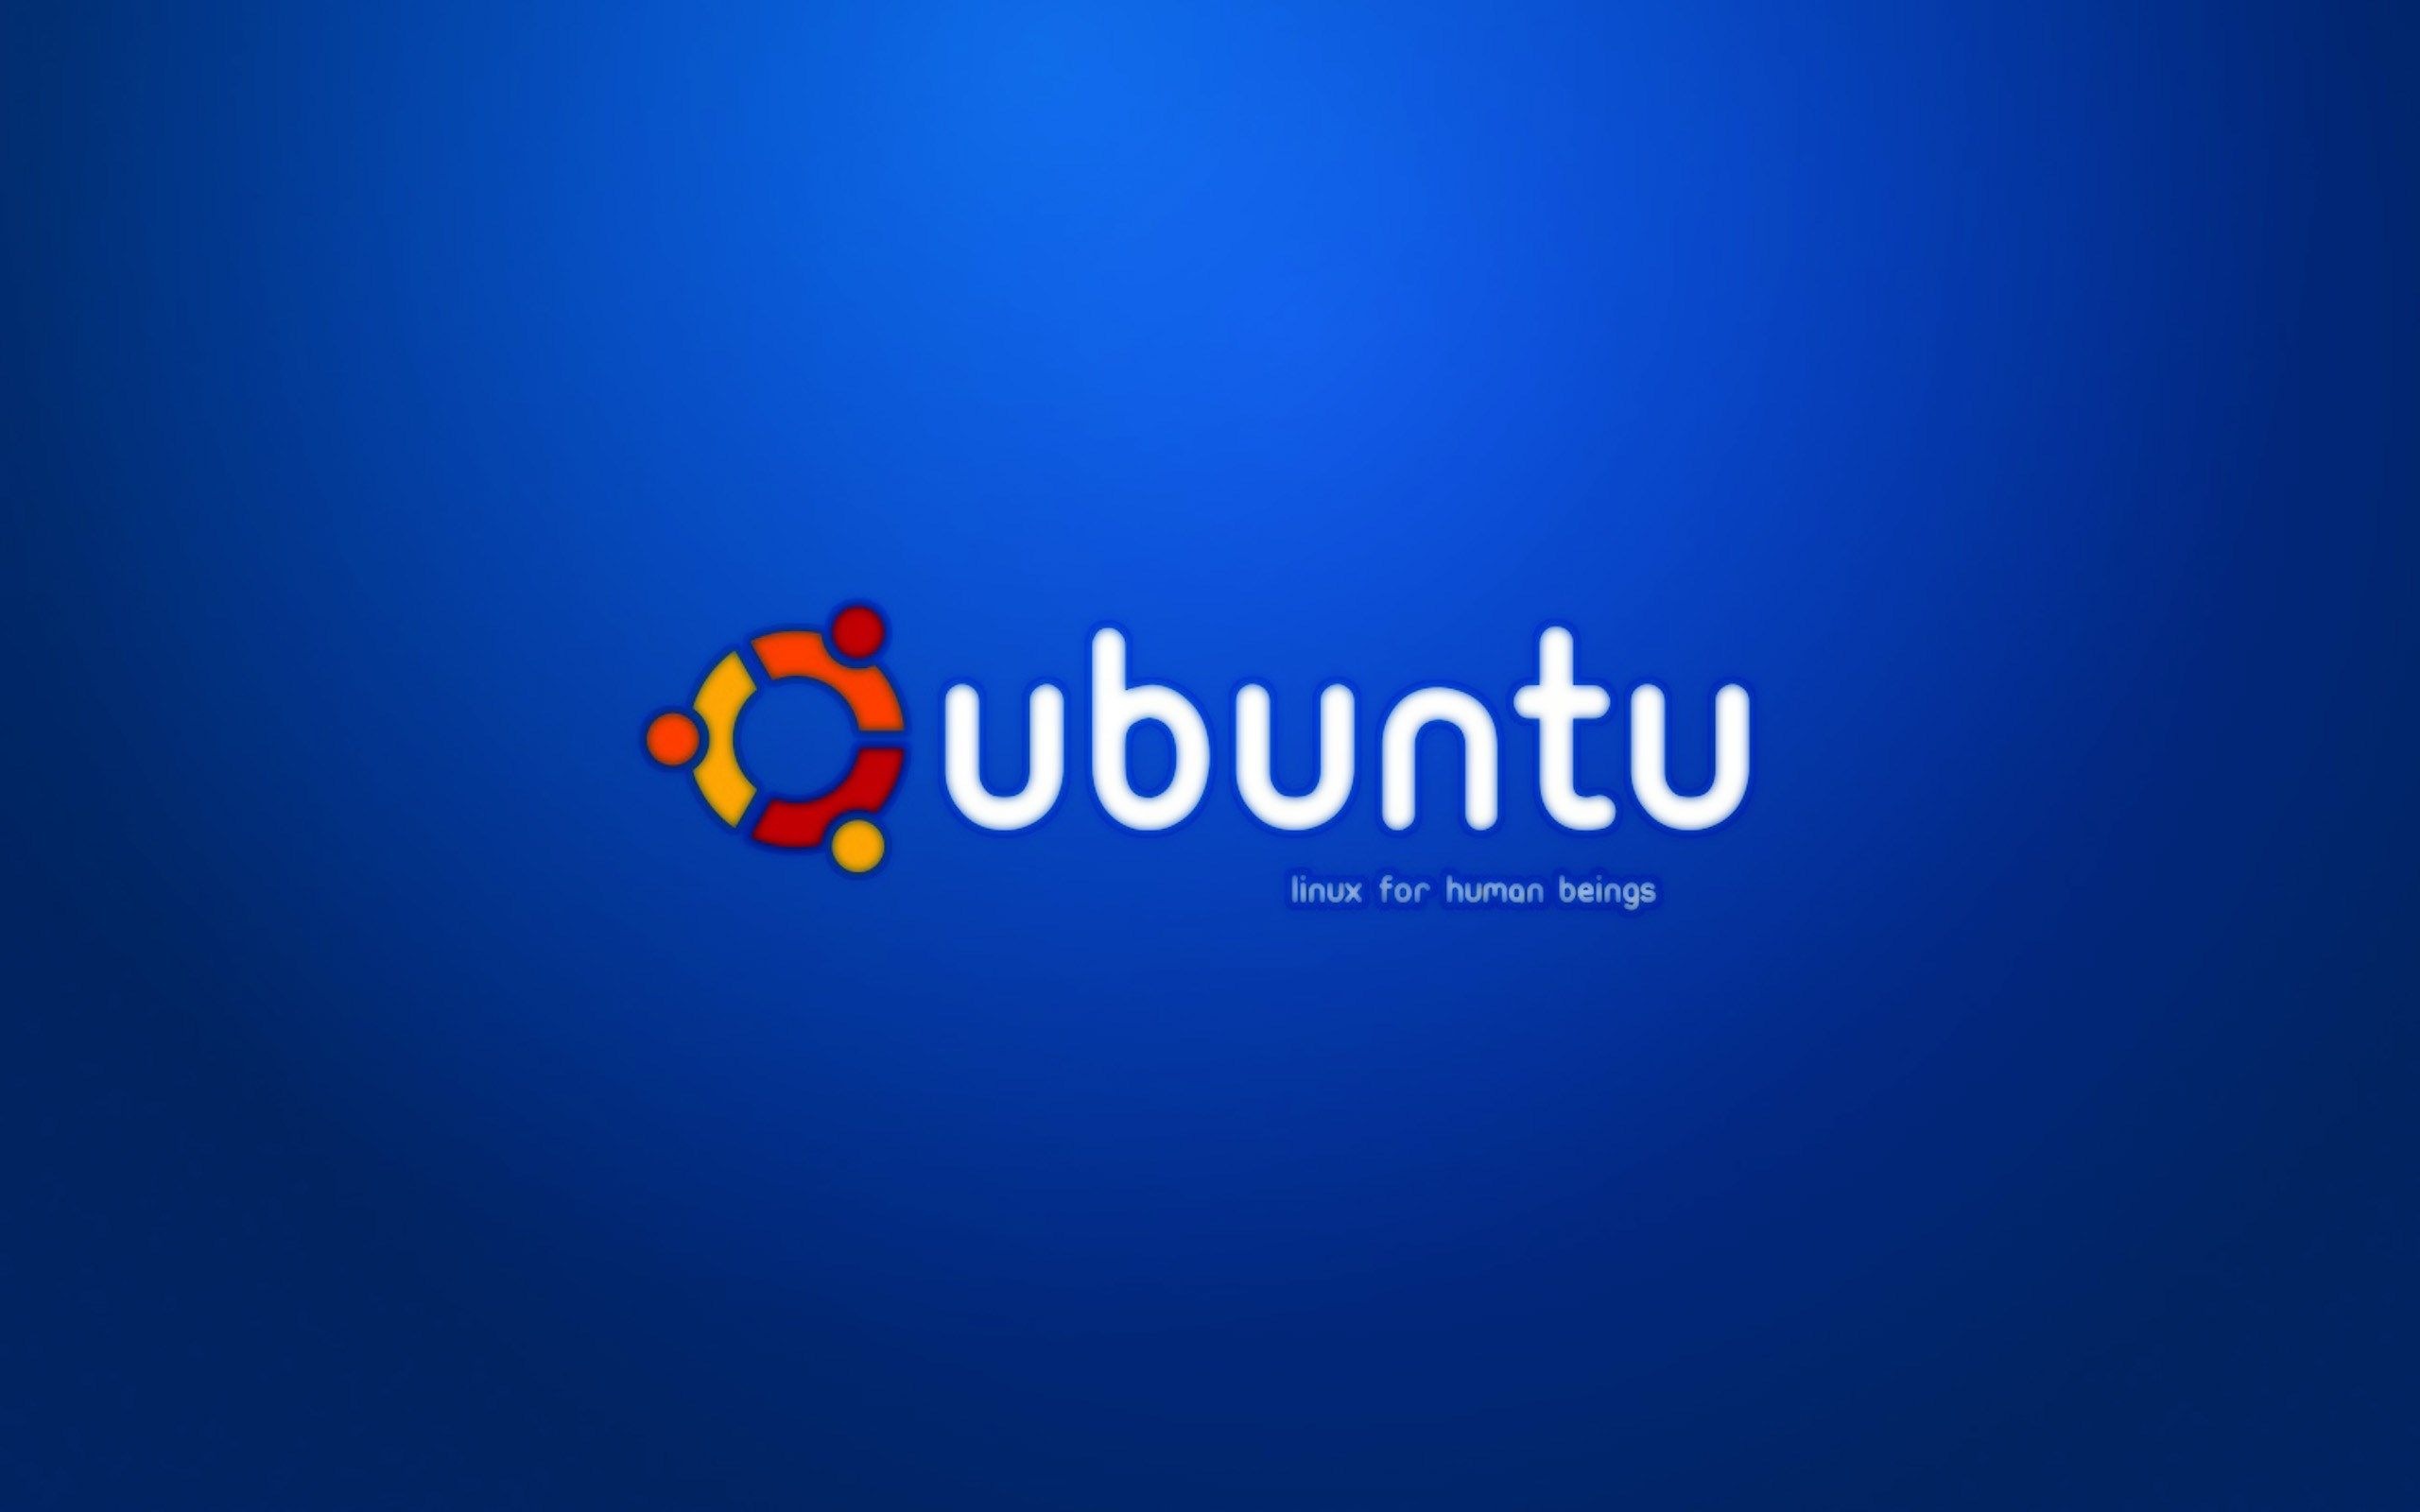 ubuntu wallpapers hd background pictures ololoshenka background